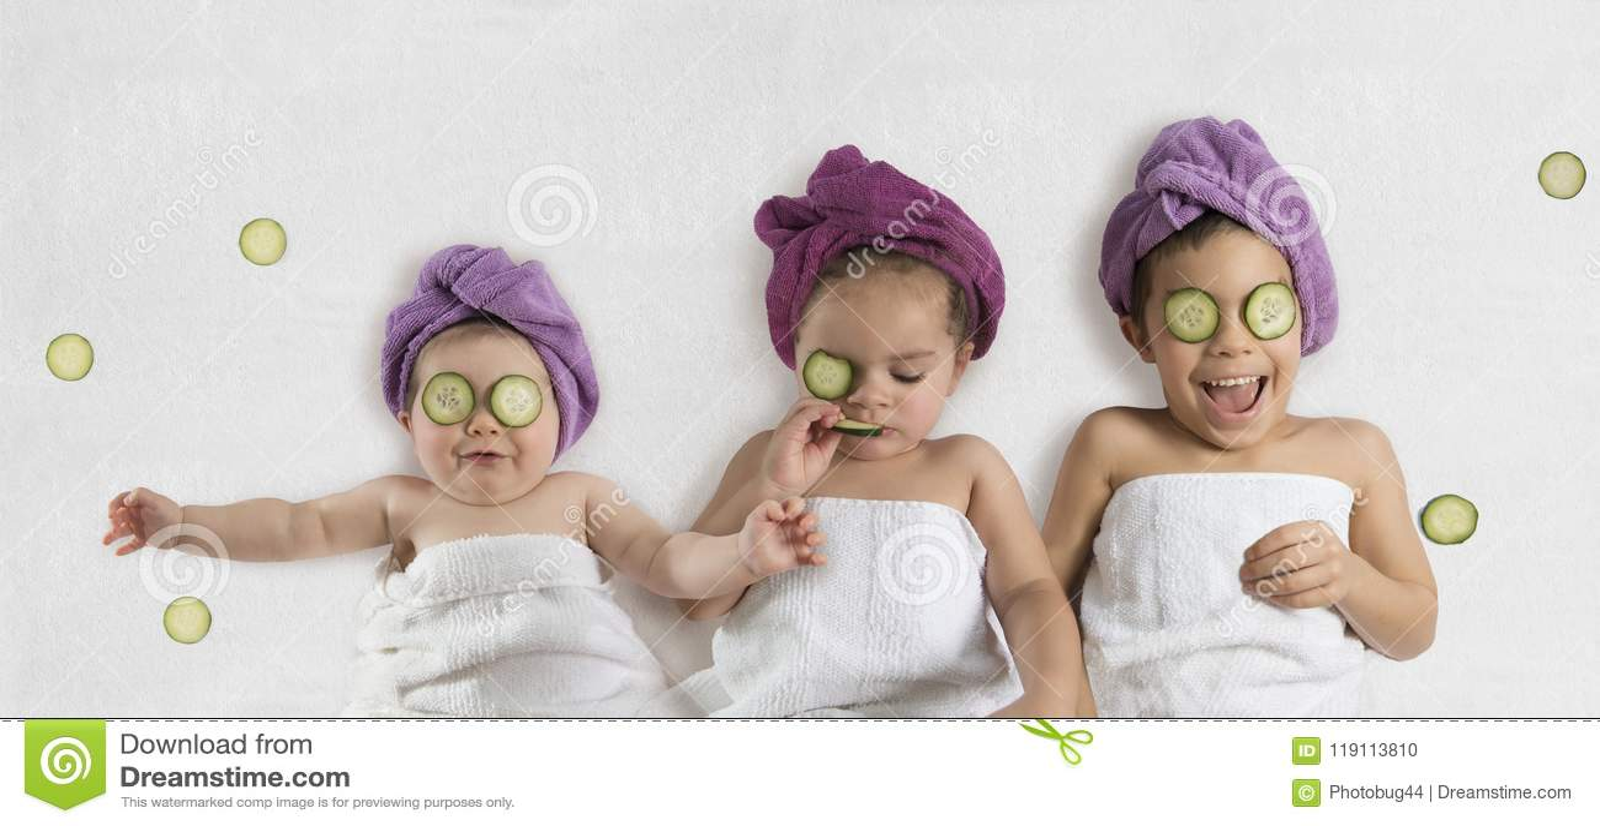 Funny kids and cucumber facials